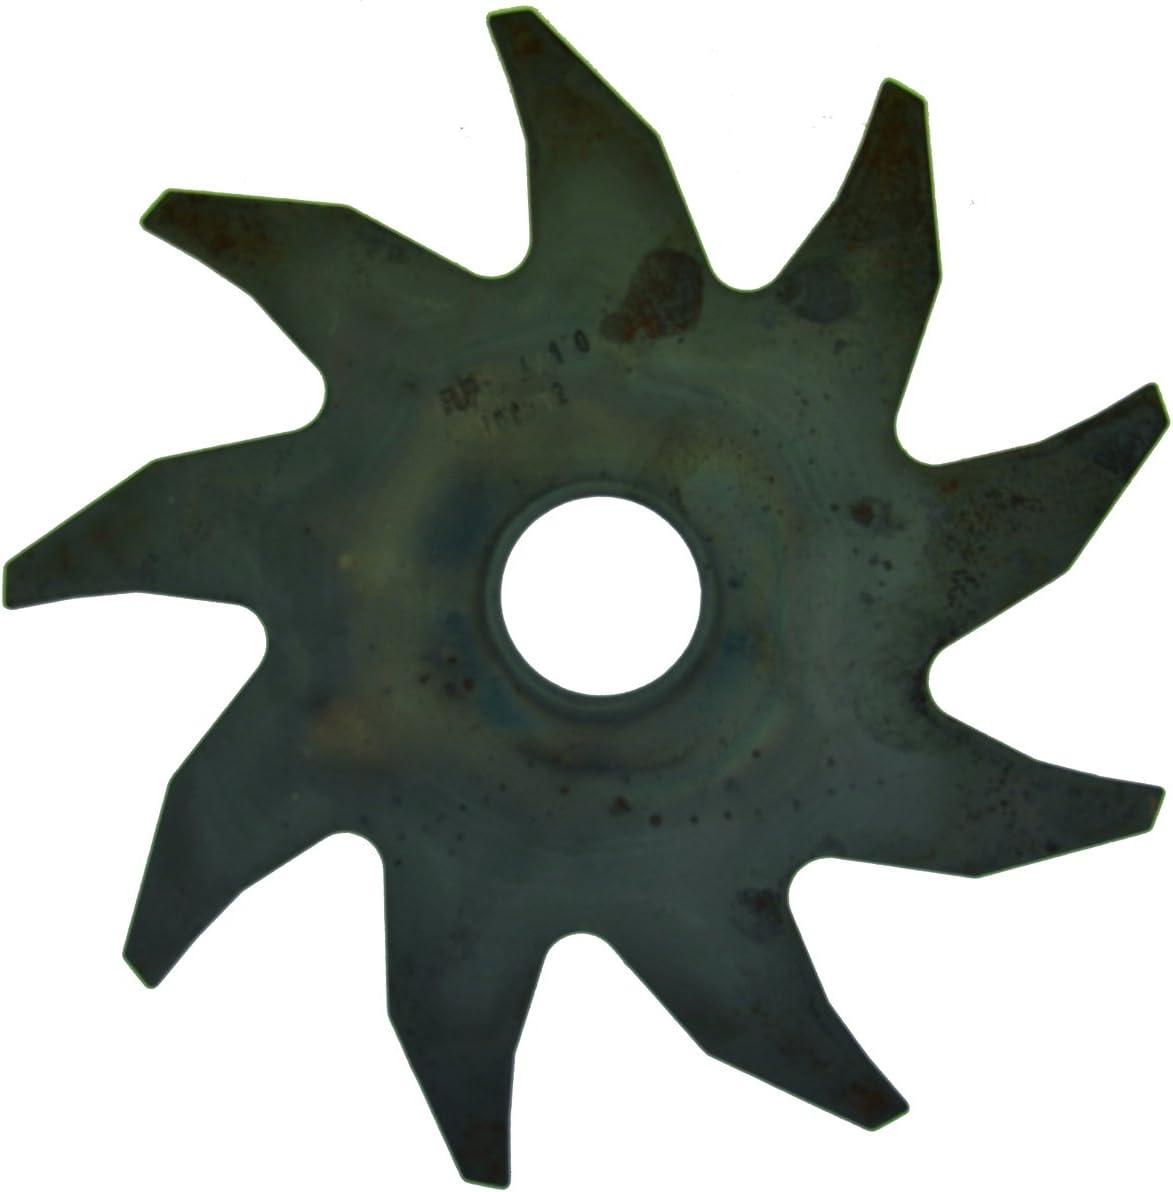 Greenstar 23758 - Adaptable para john deere cuchilla escarificadora